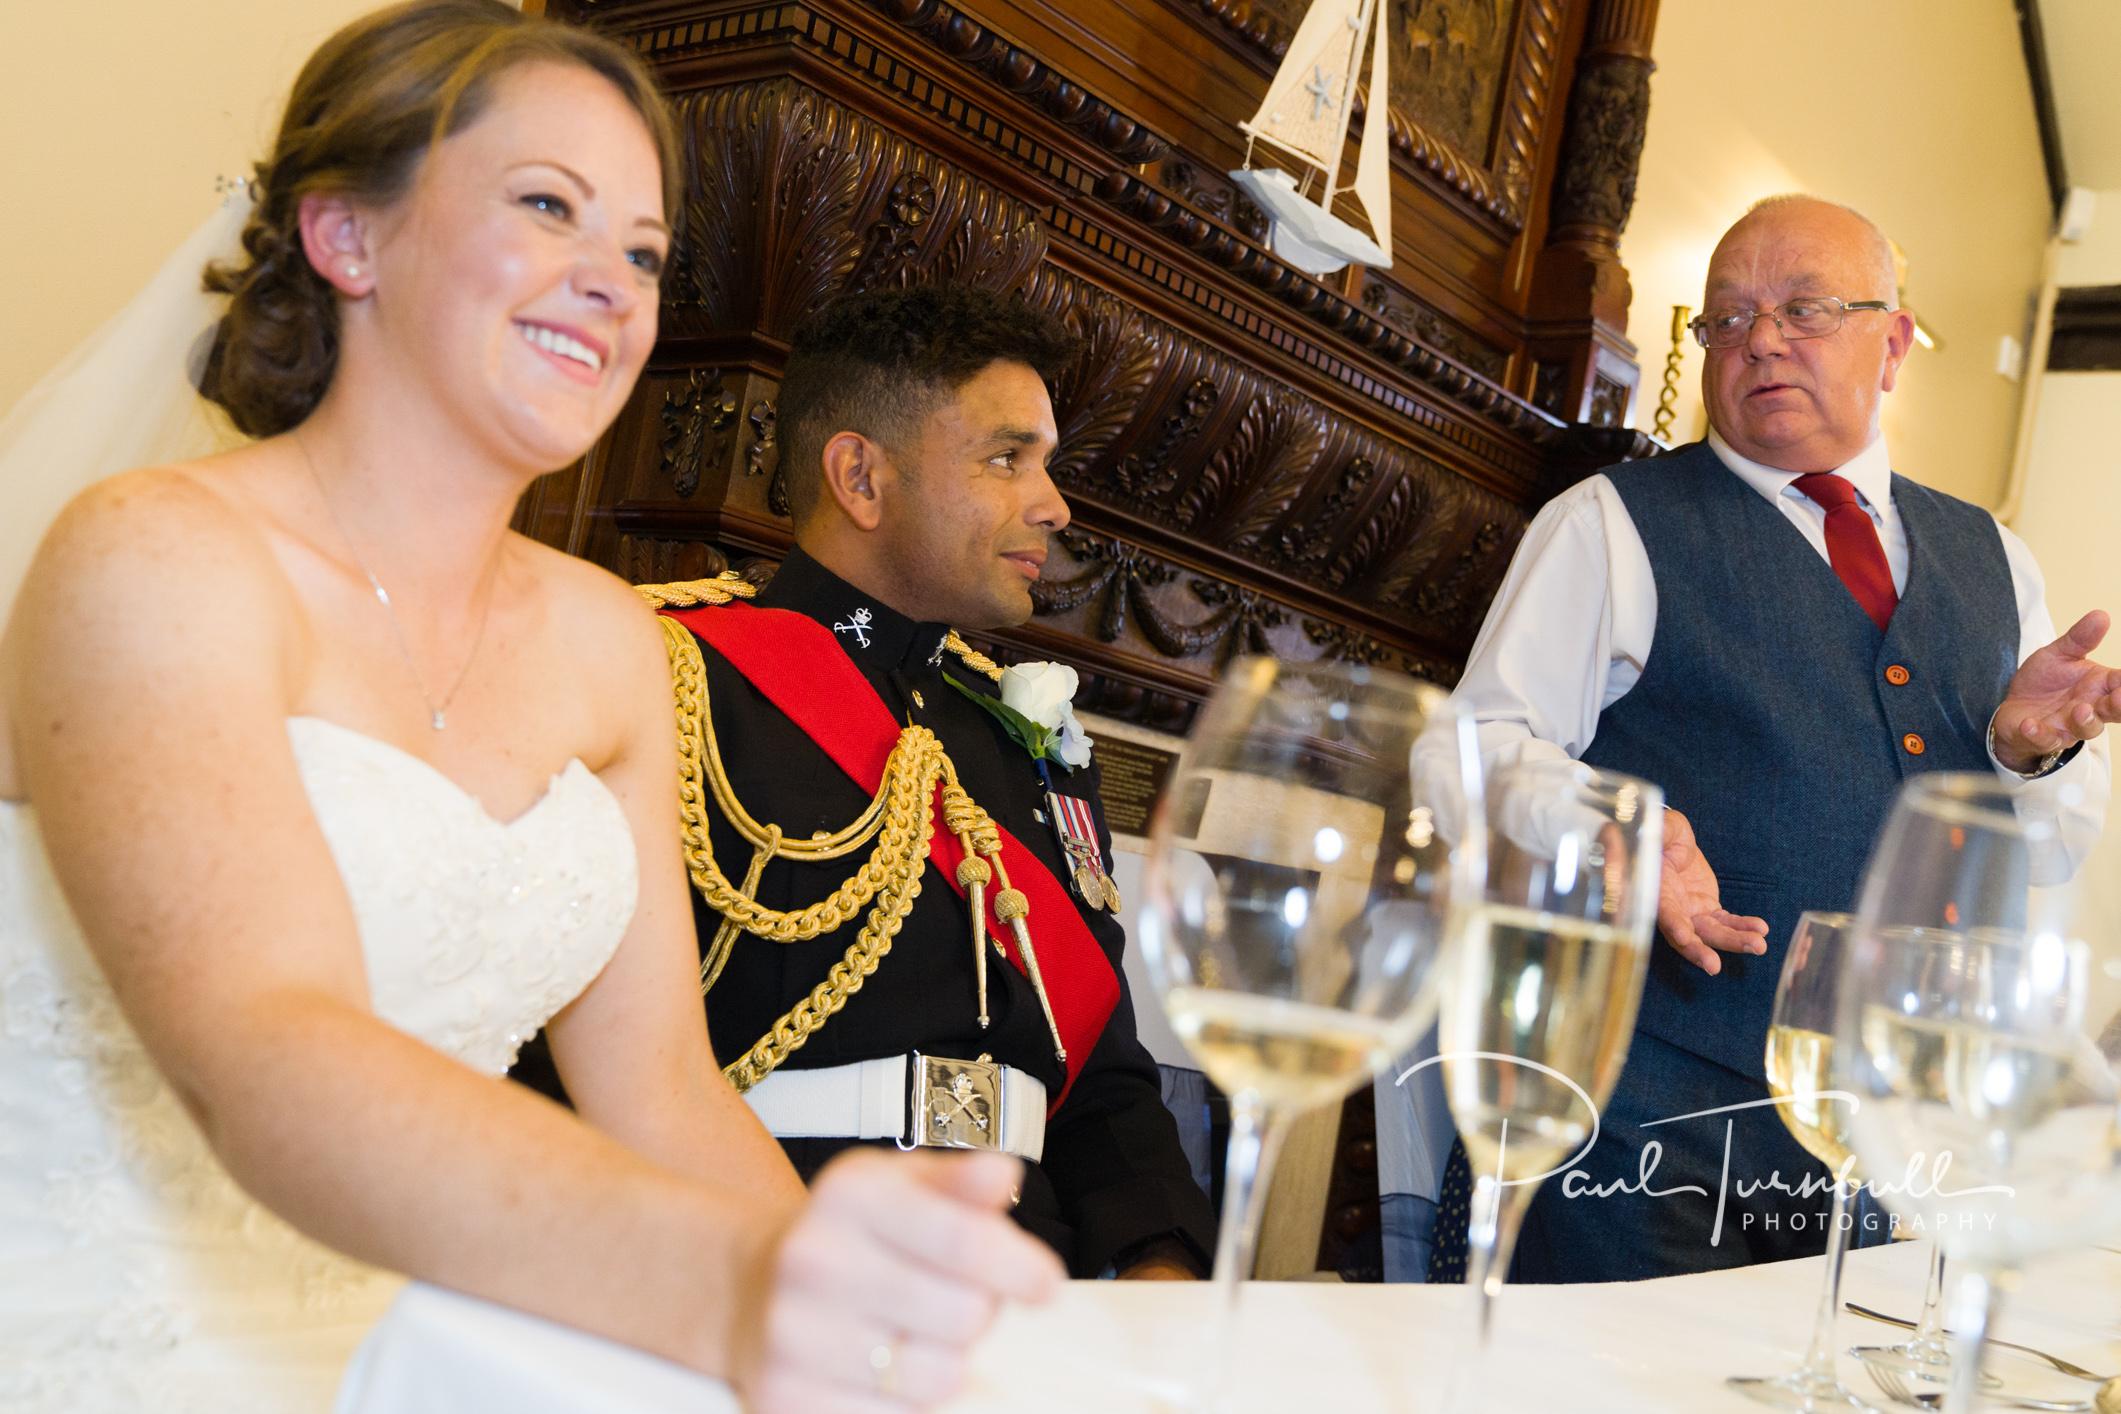 wedding-photographer-south-dalton-walkington-yorkshire-emma-james-061.jpg